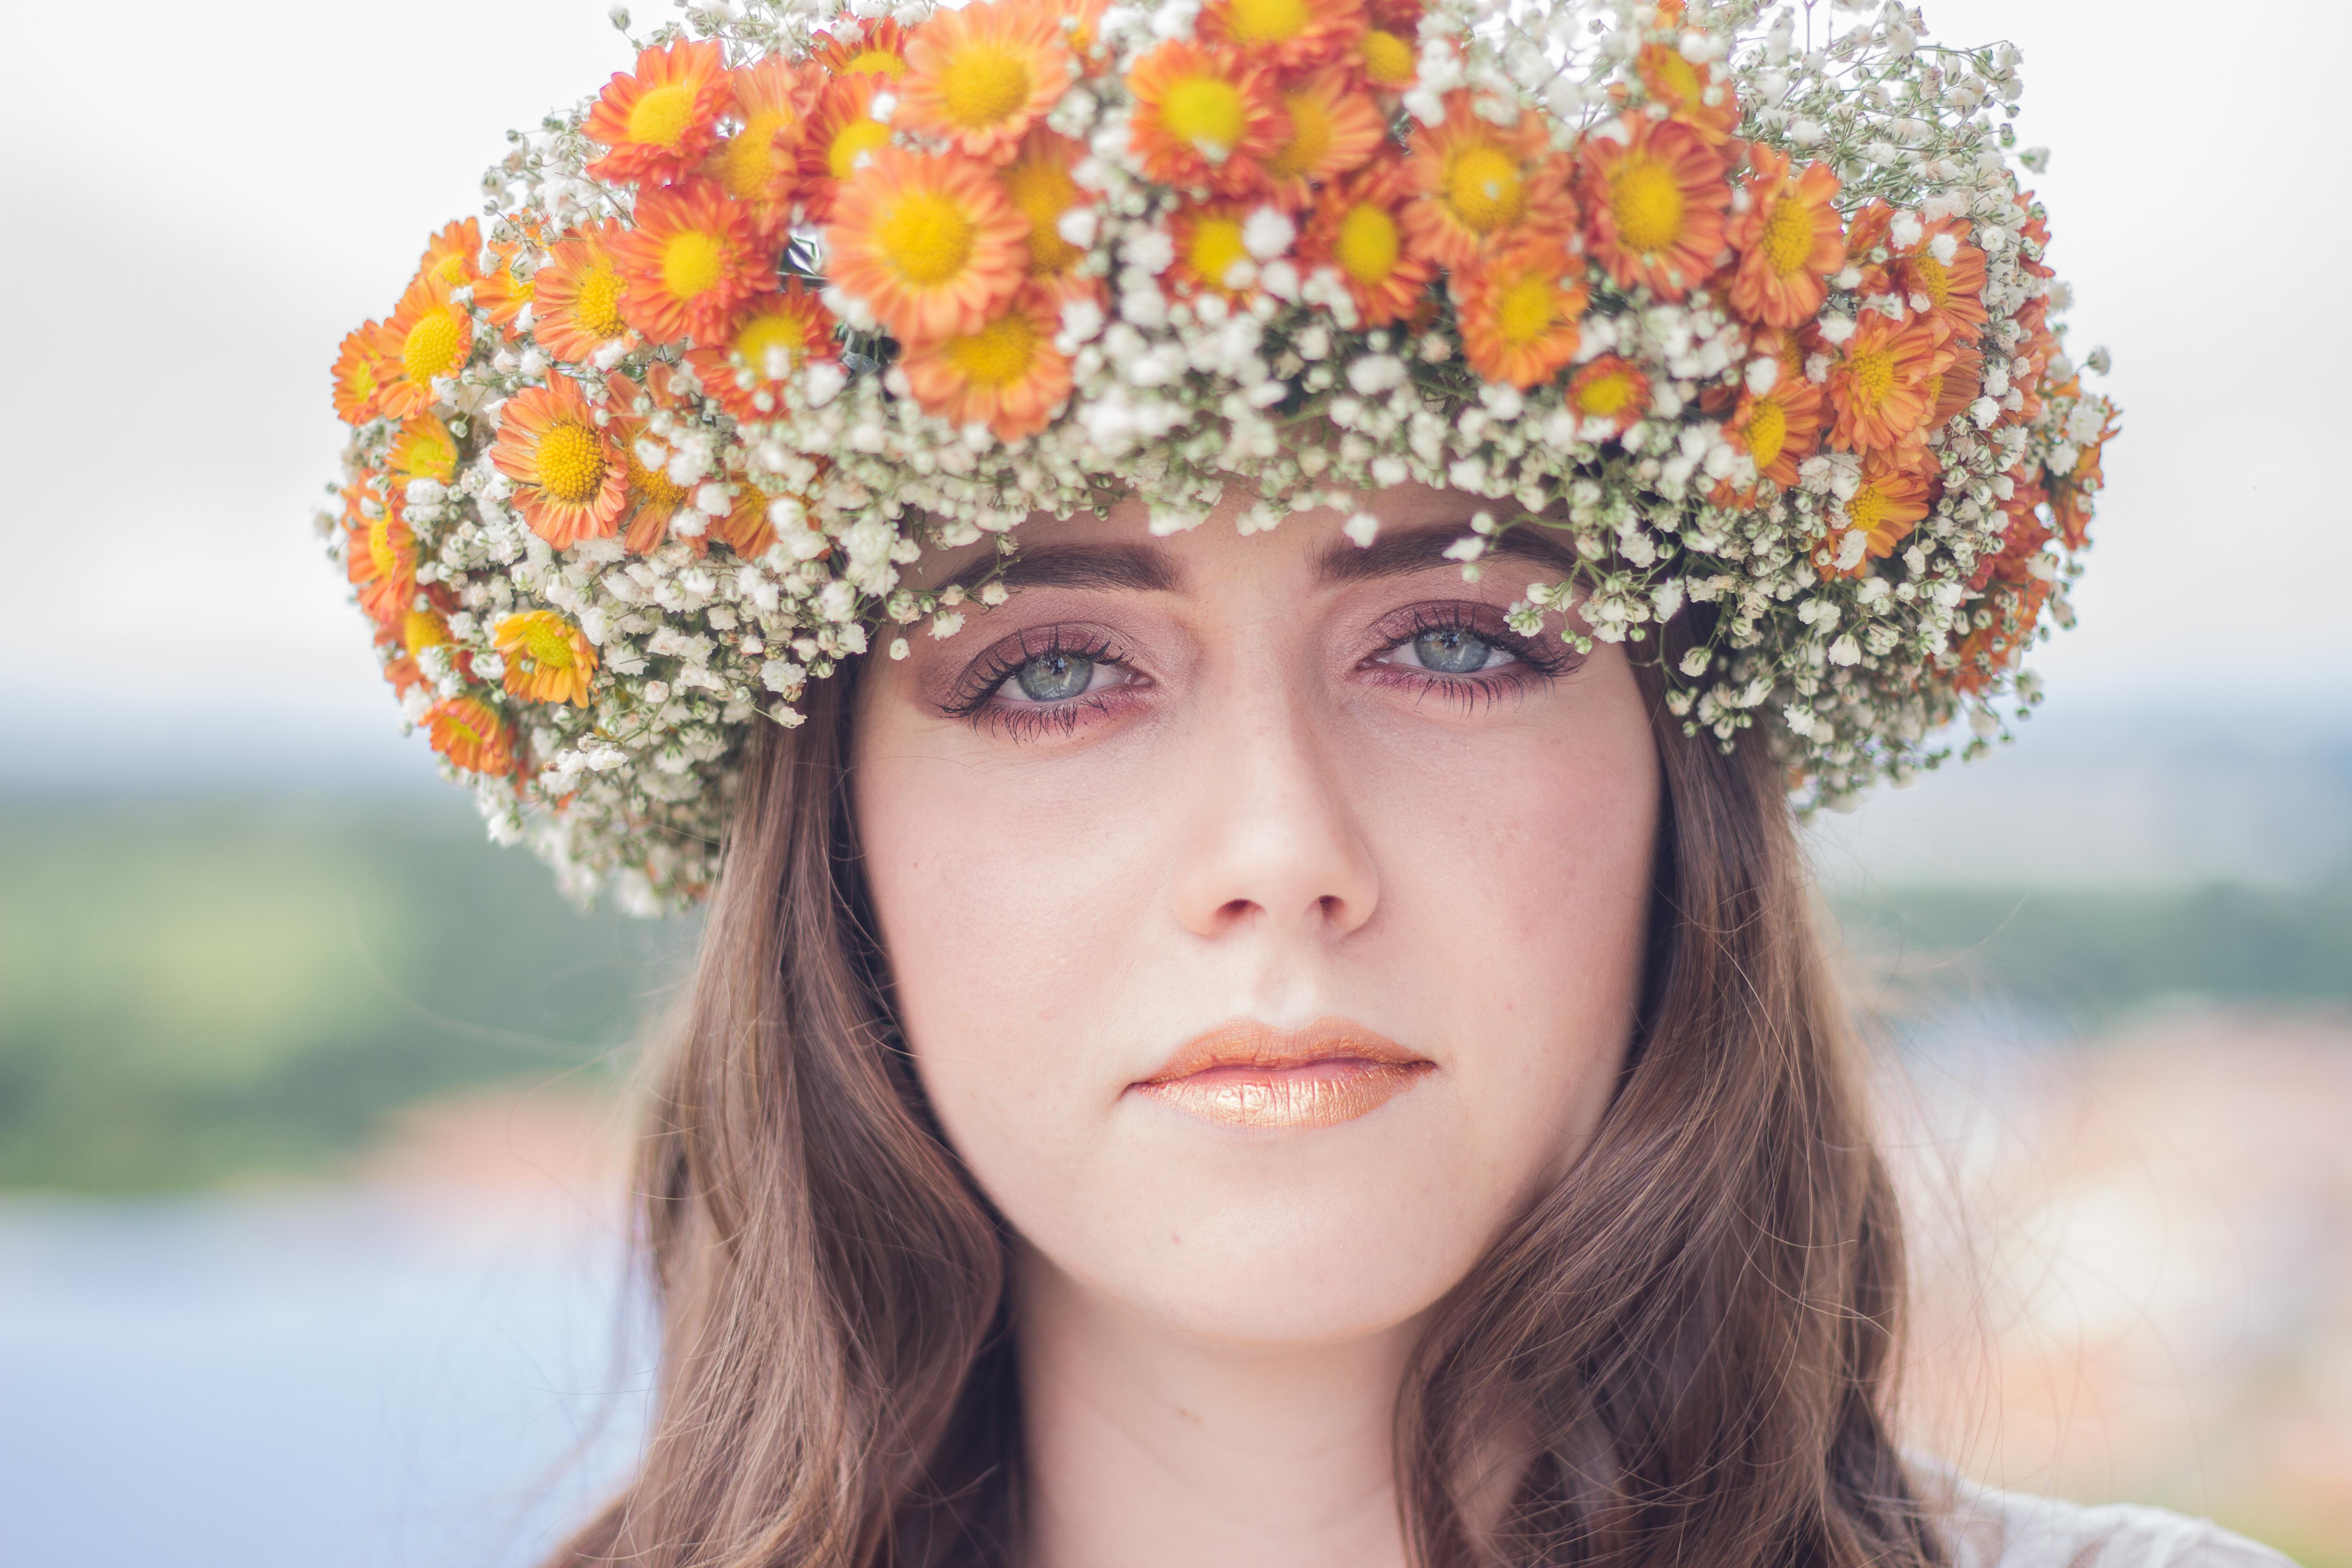 Fileimpressive Flower Crown Unsplashg Wikimedia Commons